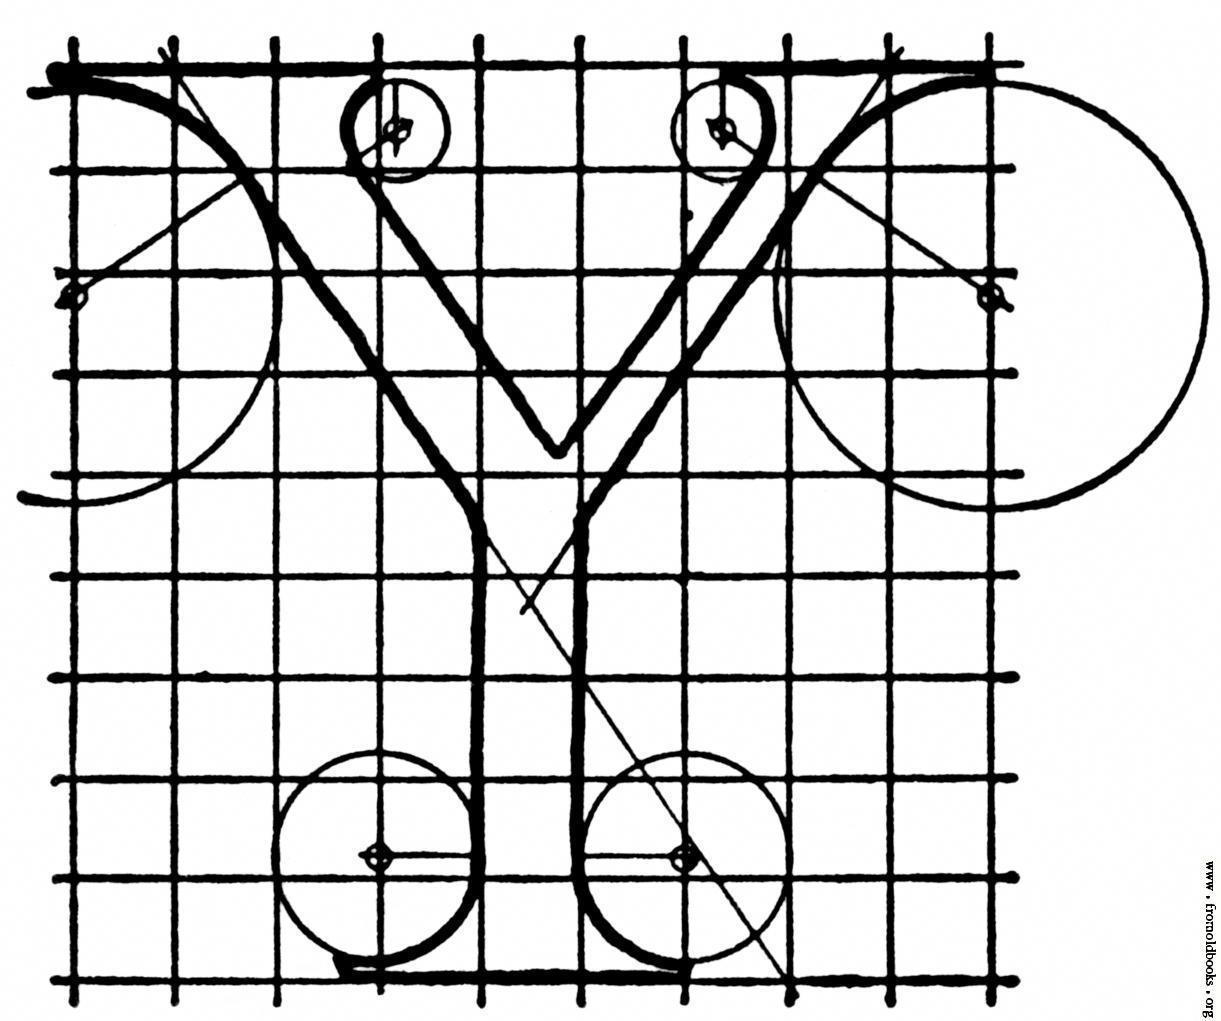 002-Alphabet-After-Serlio-LetterY-q75-1221x1021